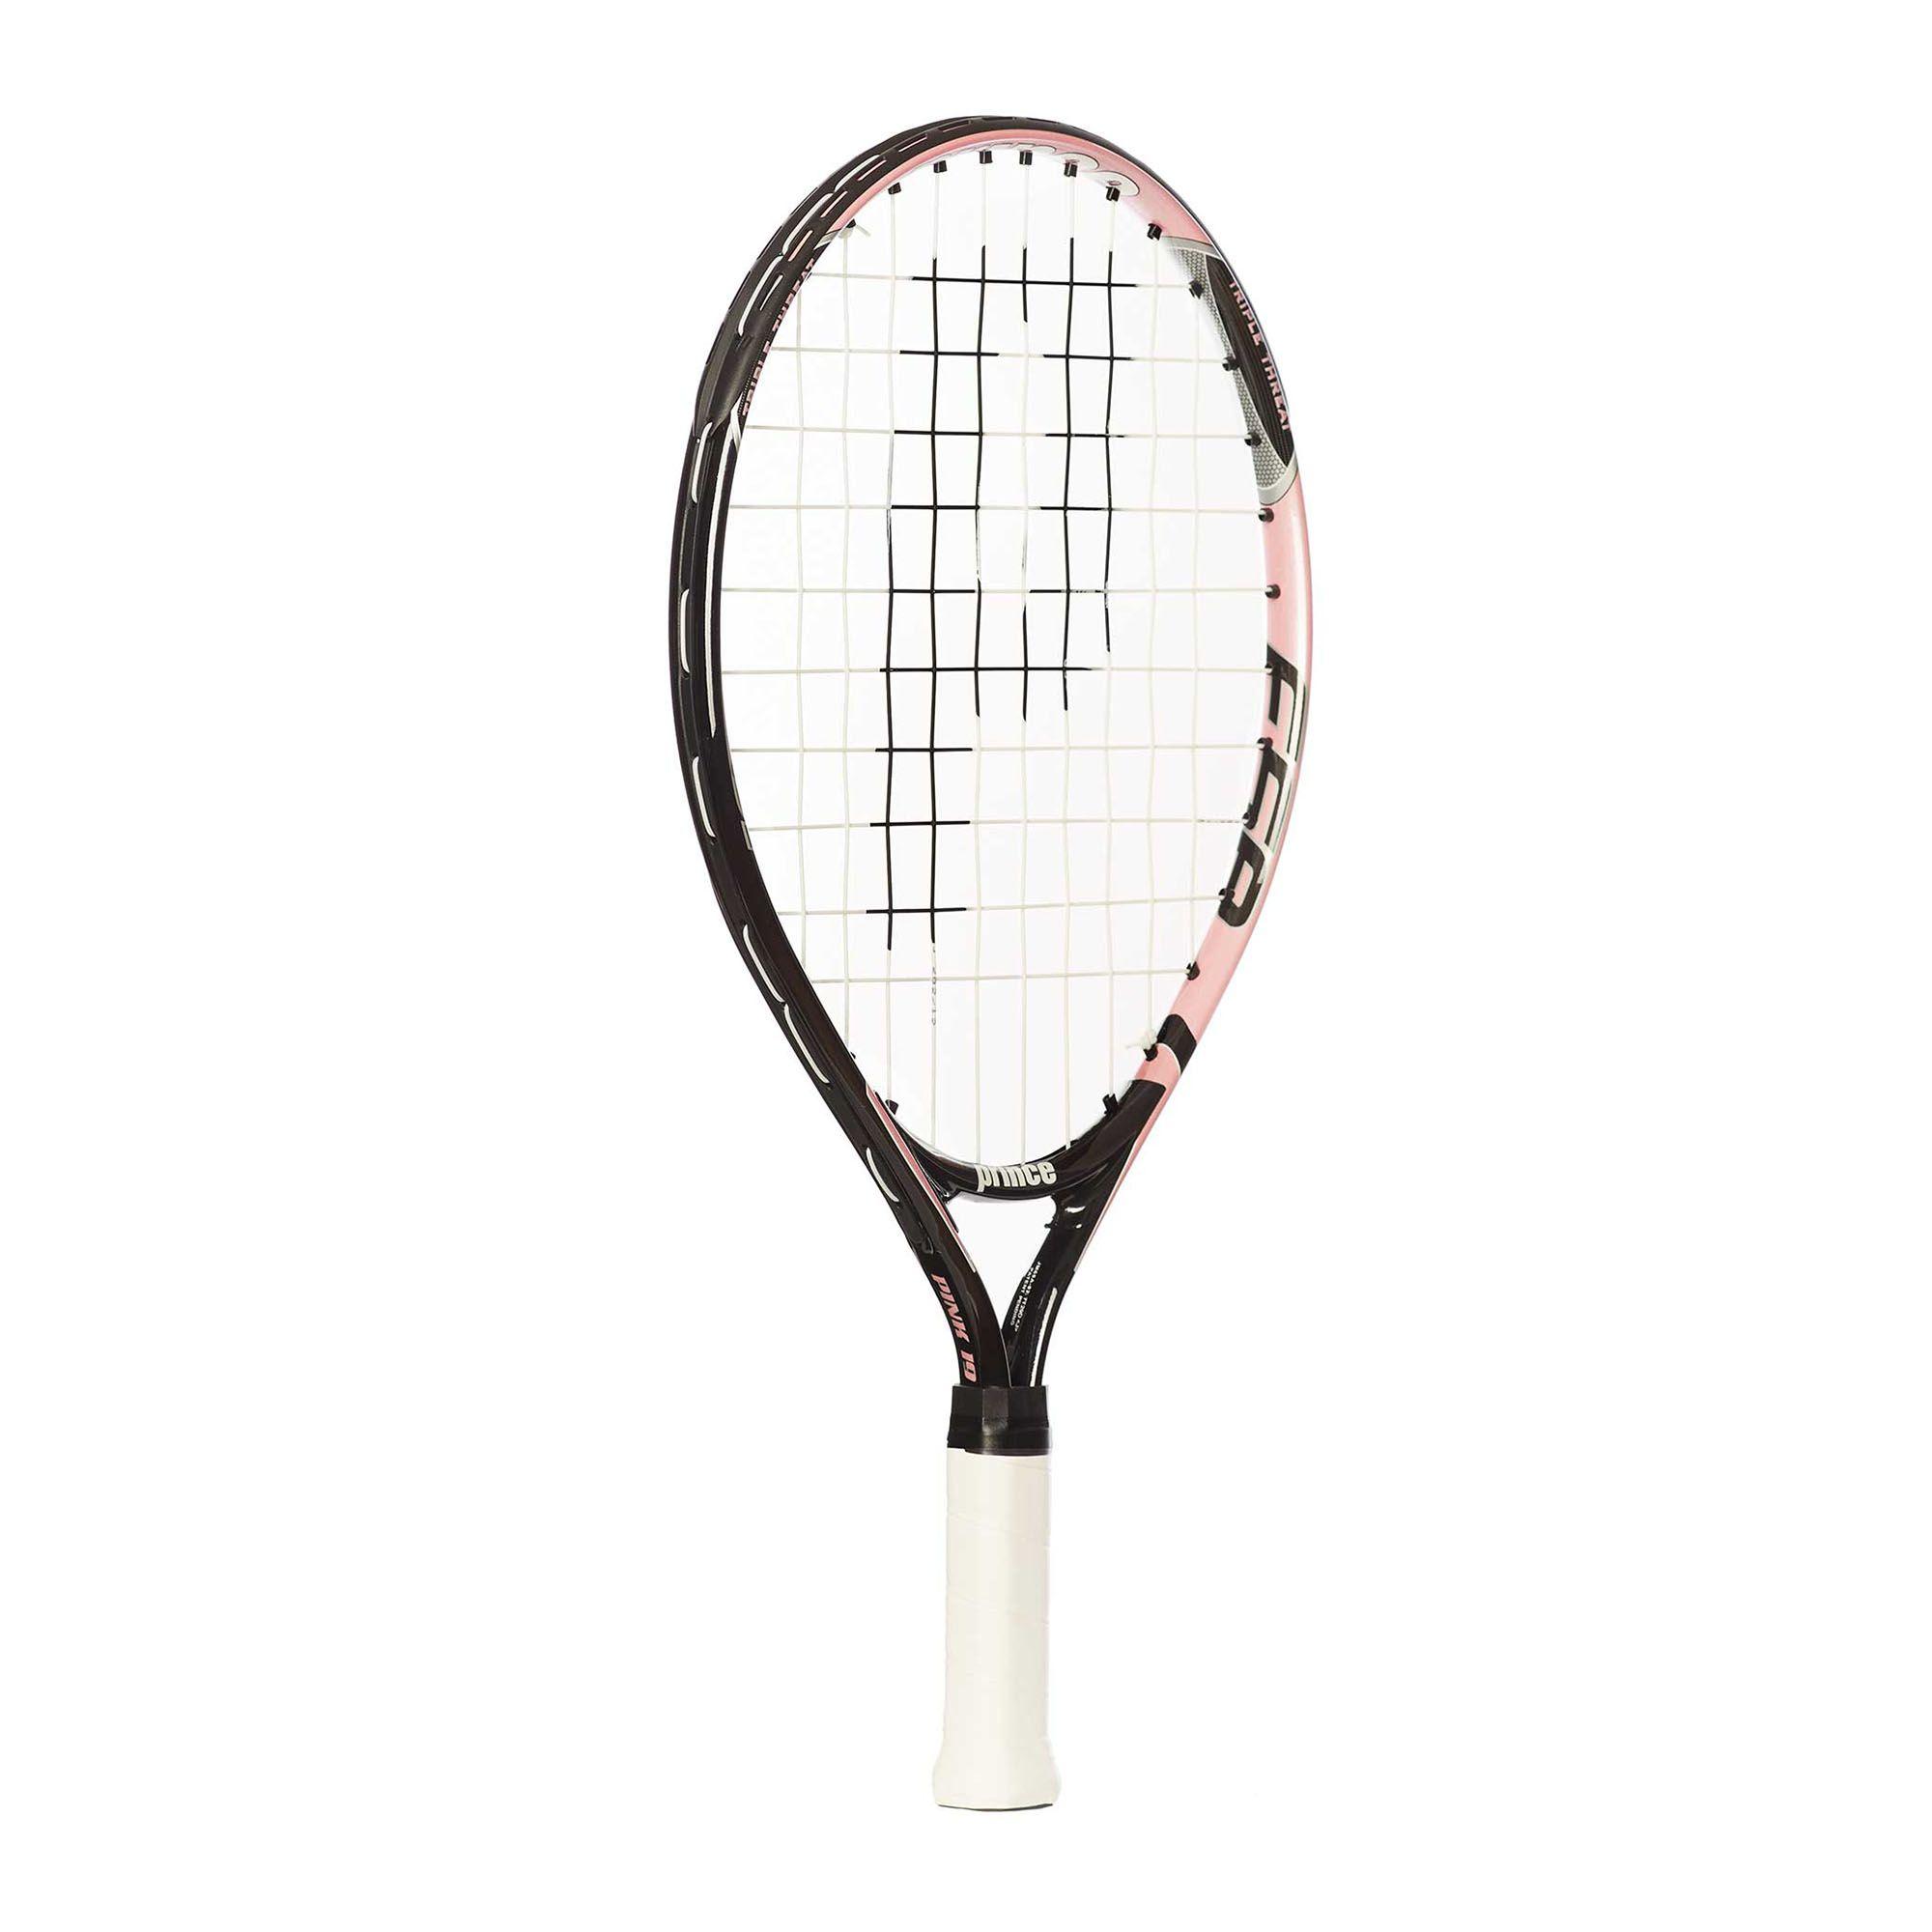 Prince Titanium Pink 19 Junior Tennis Racket - Sweatband.com